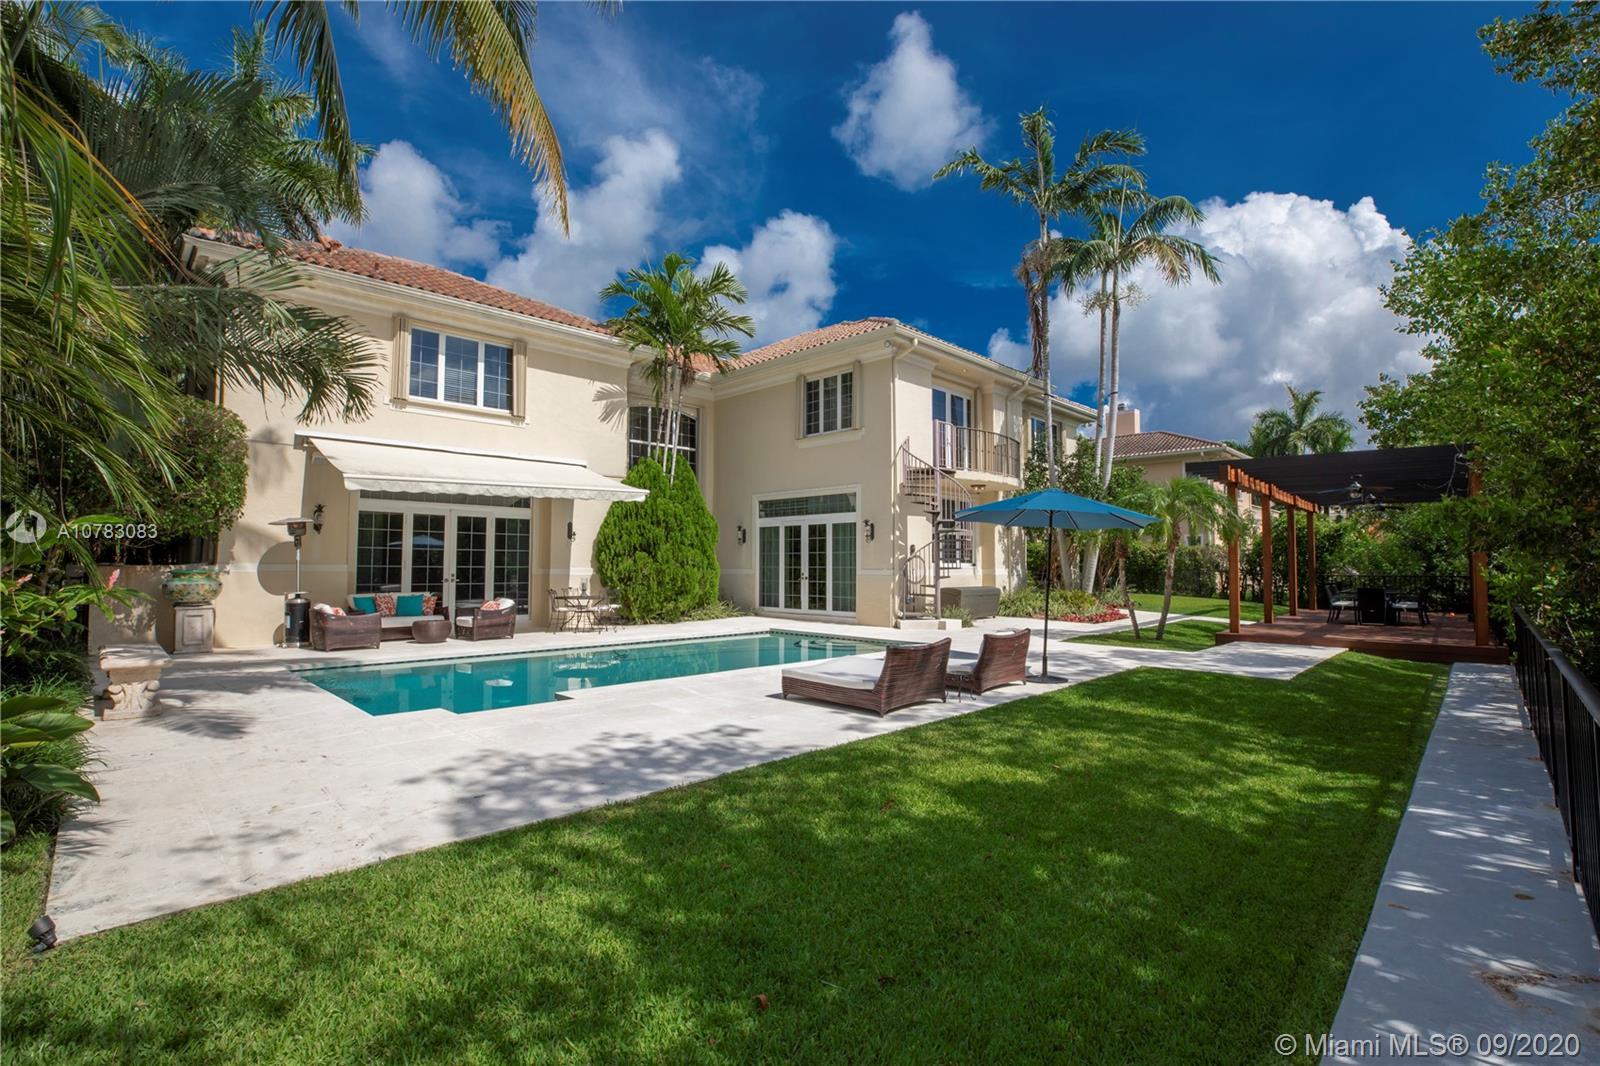 621  Destacada Avenue  For Sale A10783083, FL